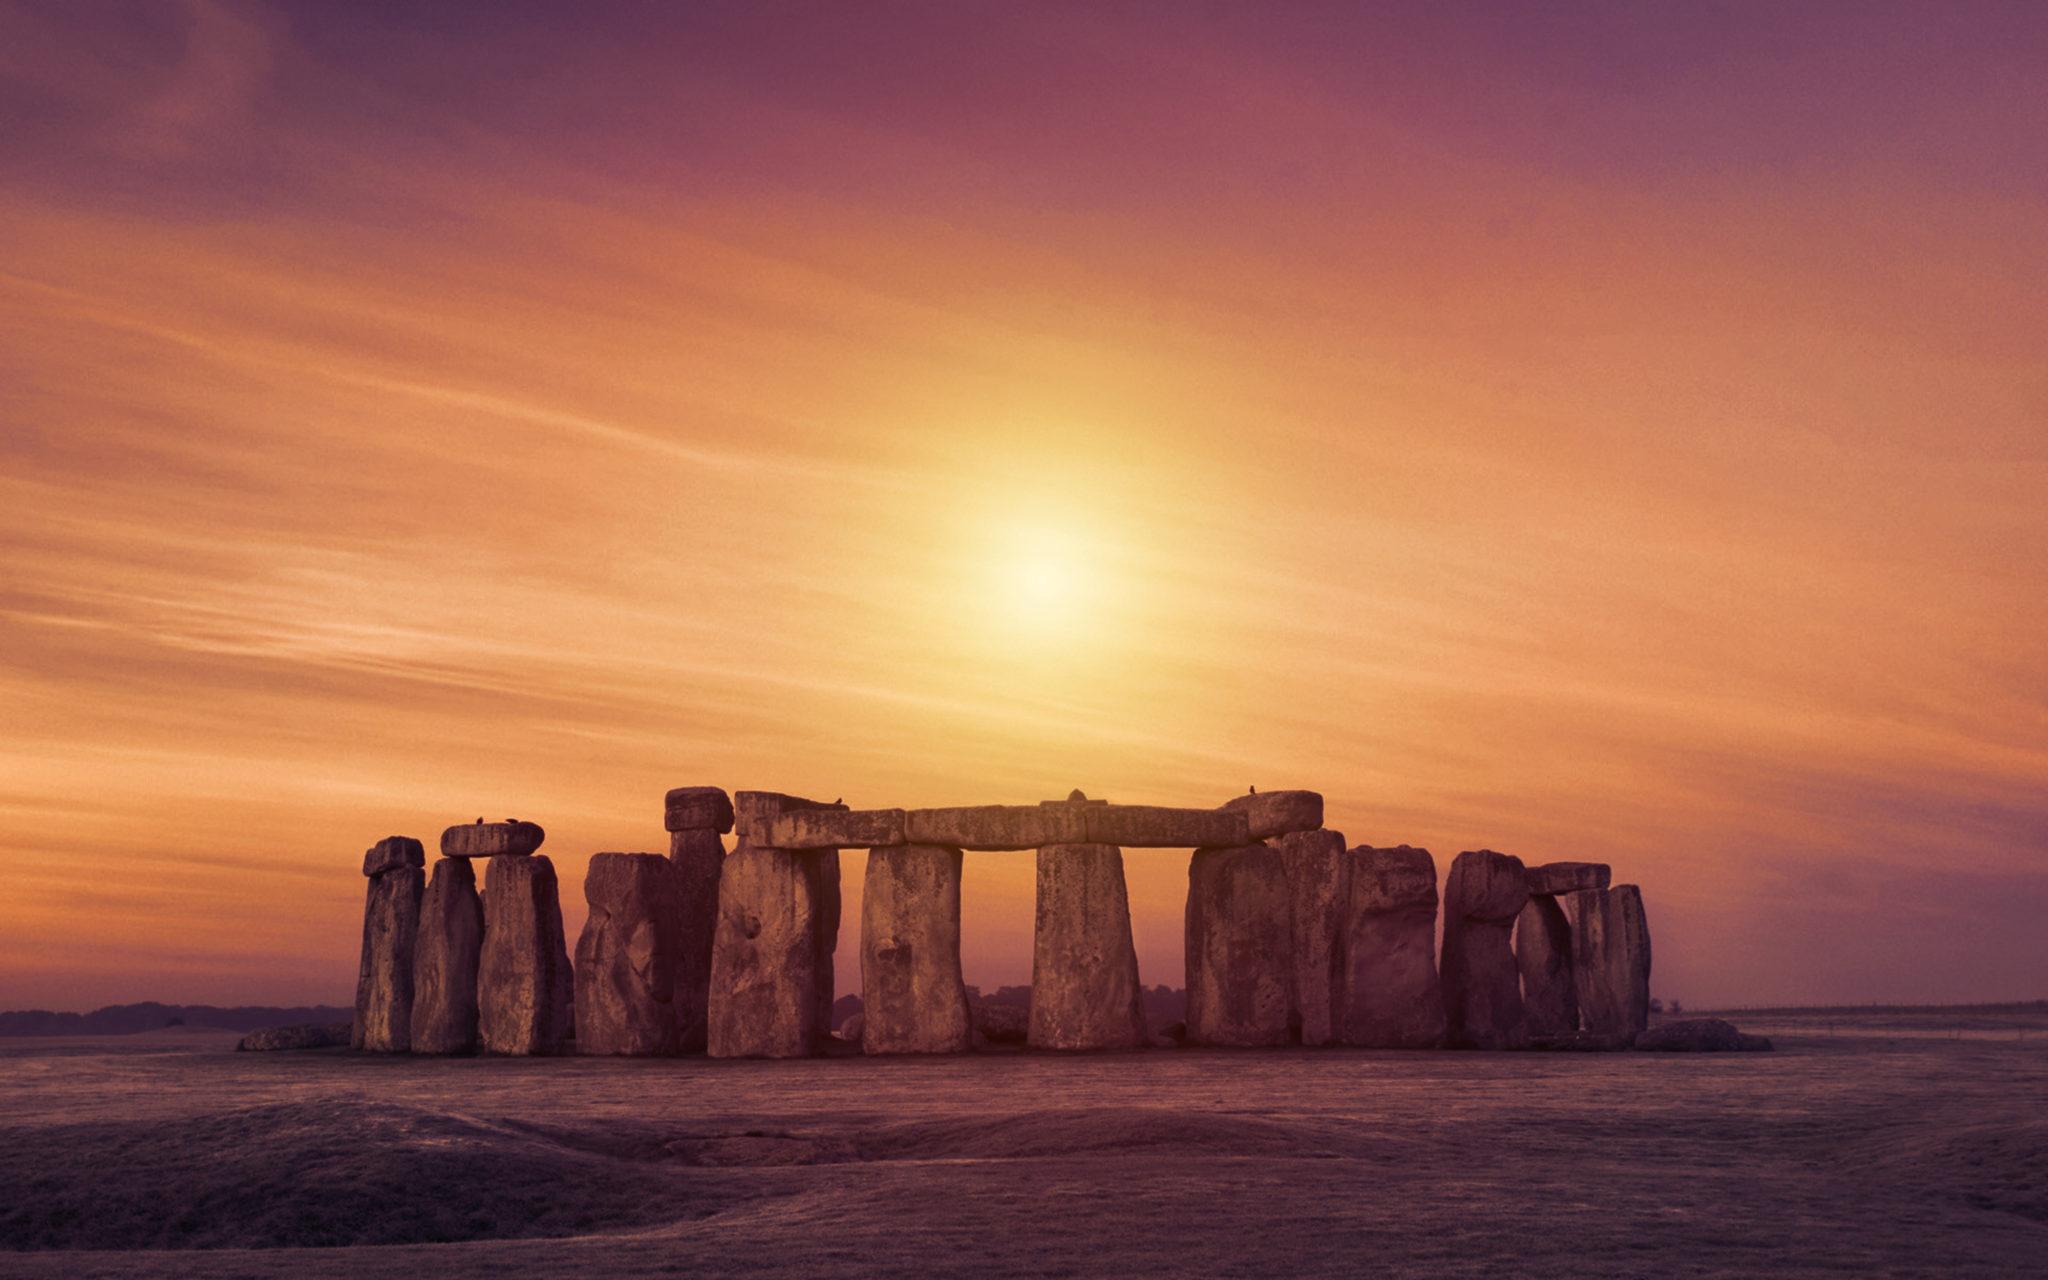 stonehenge historical sites